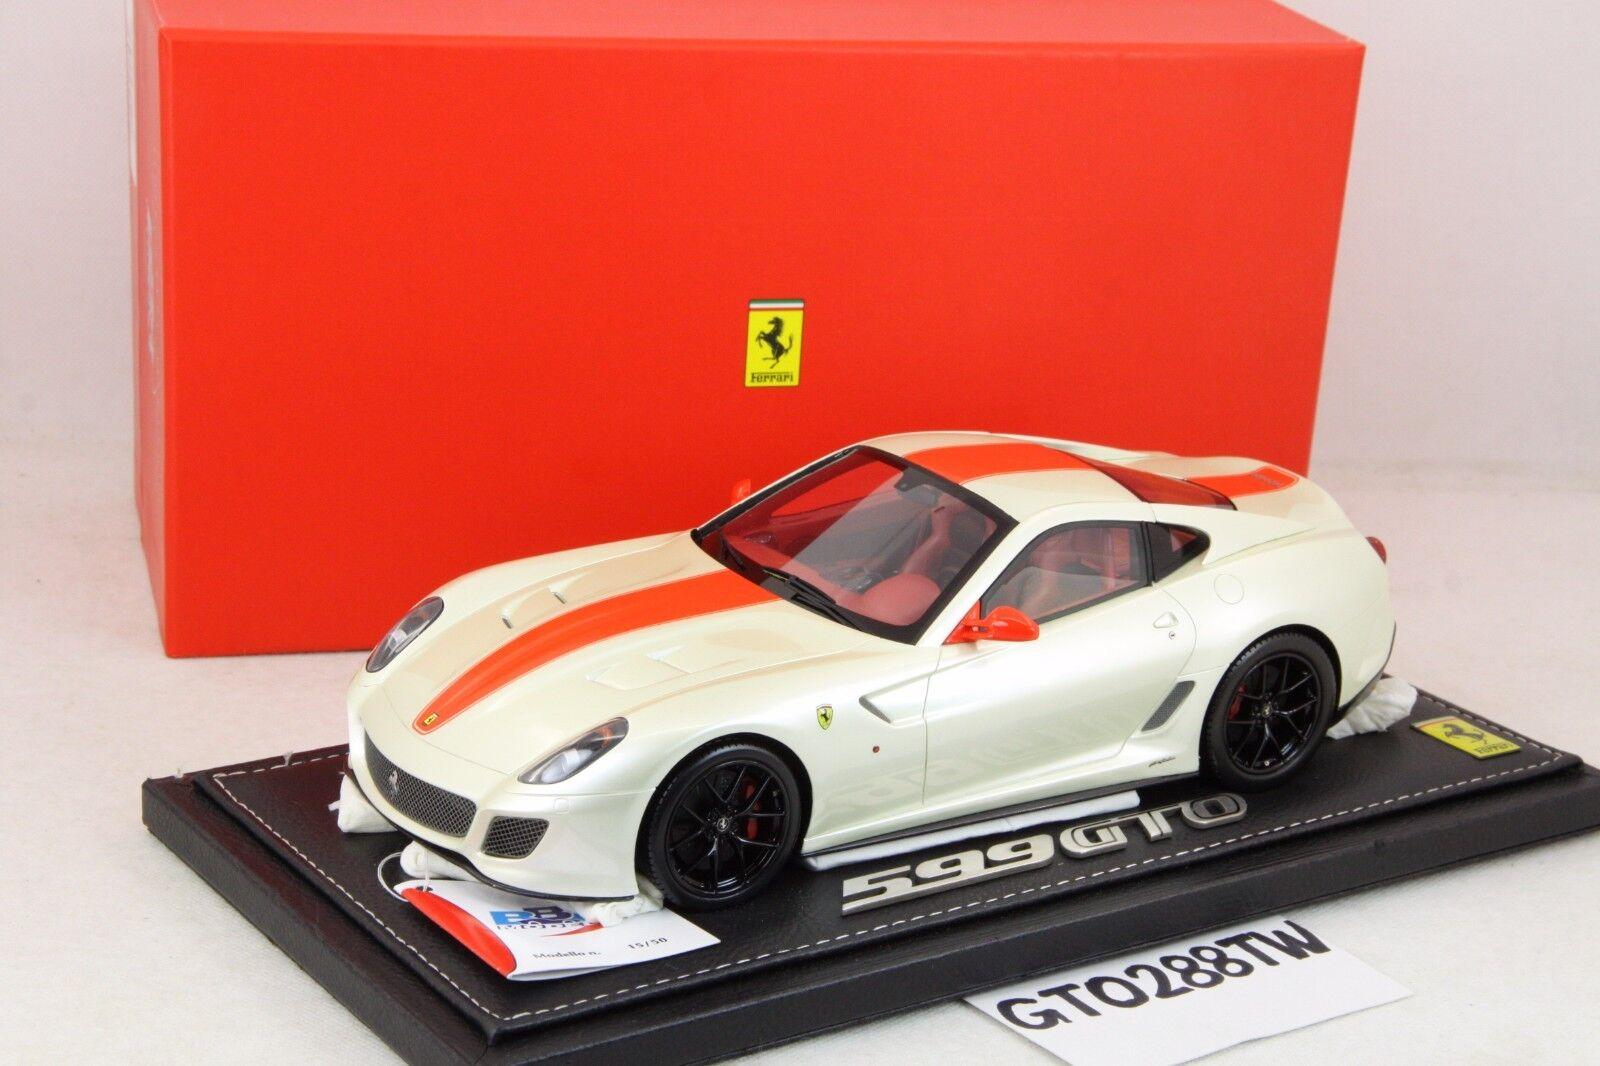 BBR 1 18 Scale Ferrari 599 GTO-Pearl blanc rouge Strip (limited 50pcs) P1816PWR